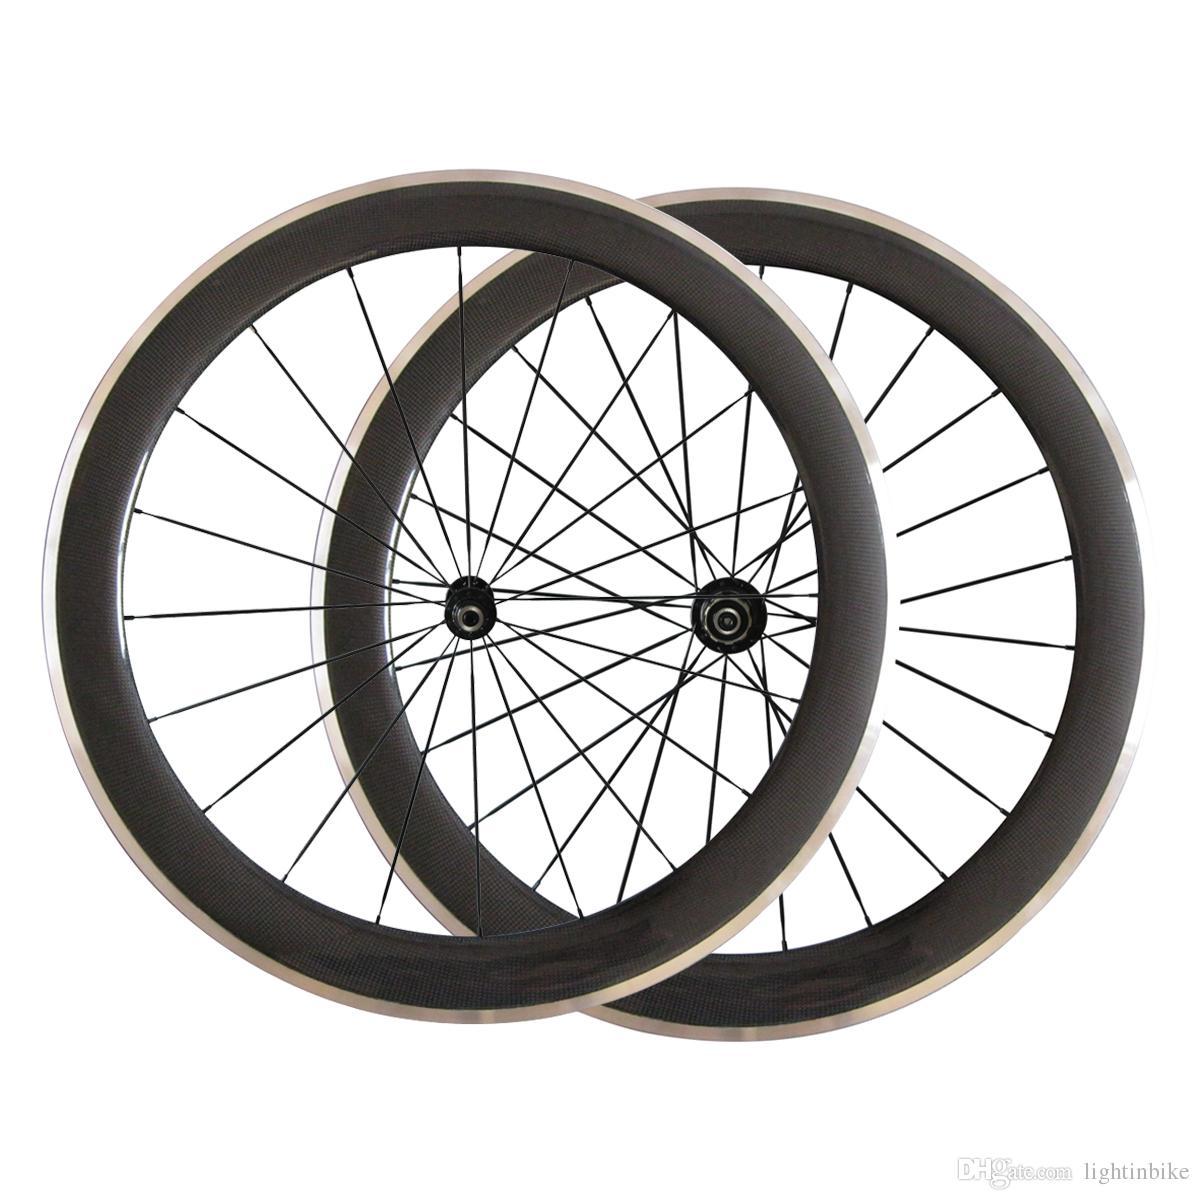 700C 60mm clincher full carbon bike wheel alloy brake,front only 20.5mm width